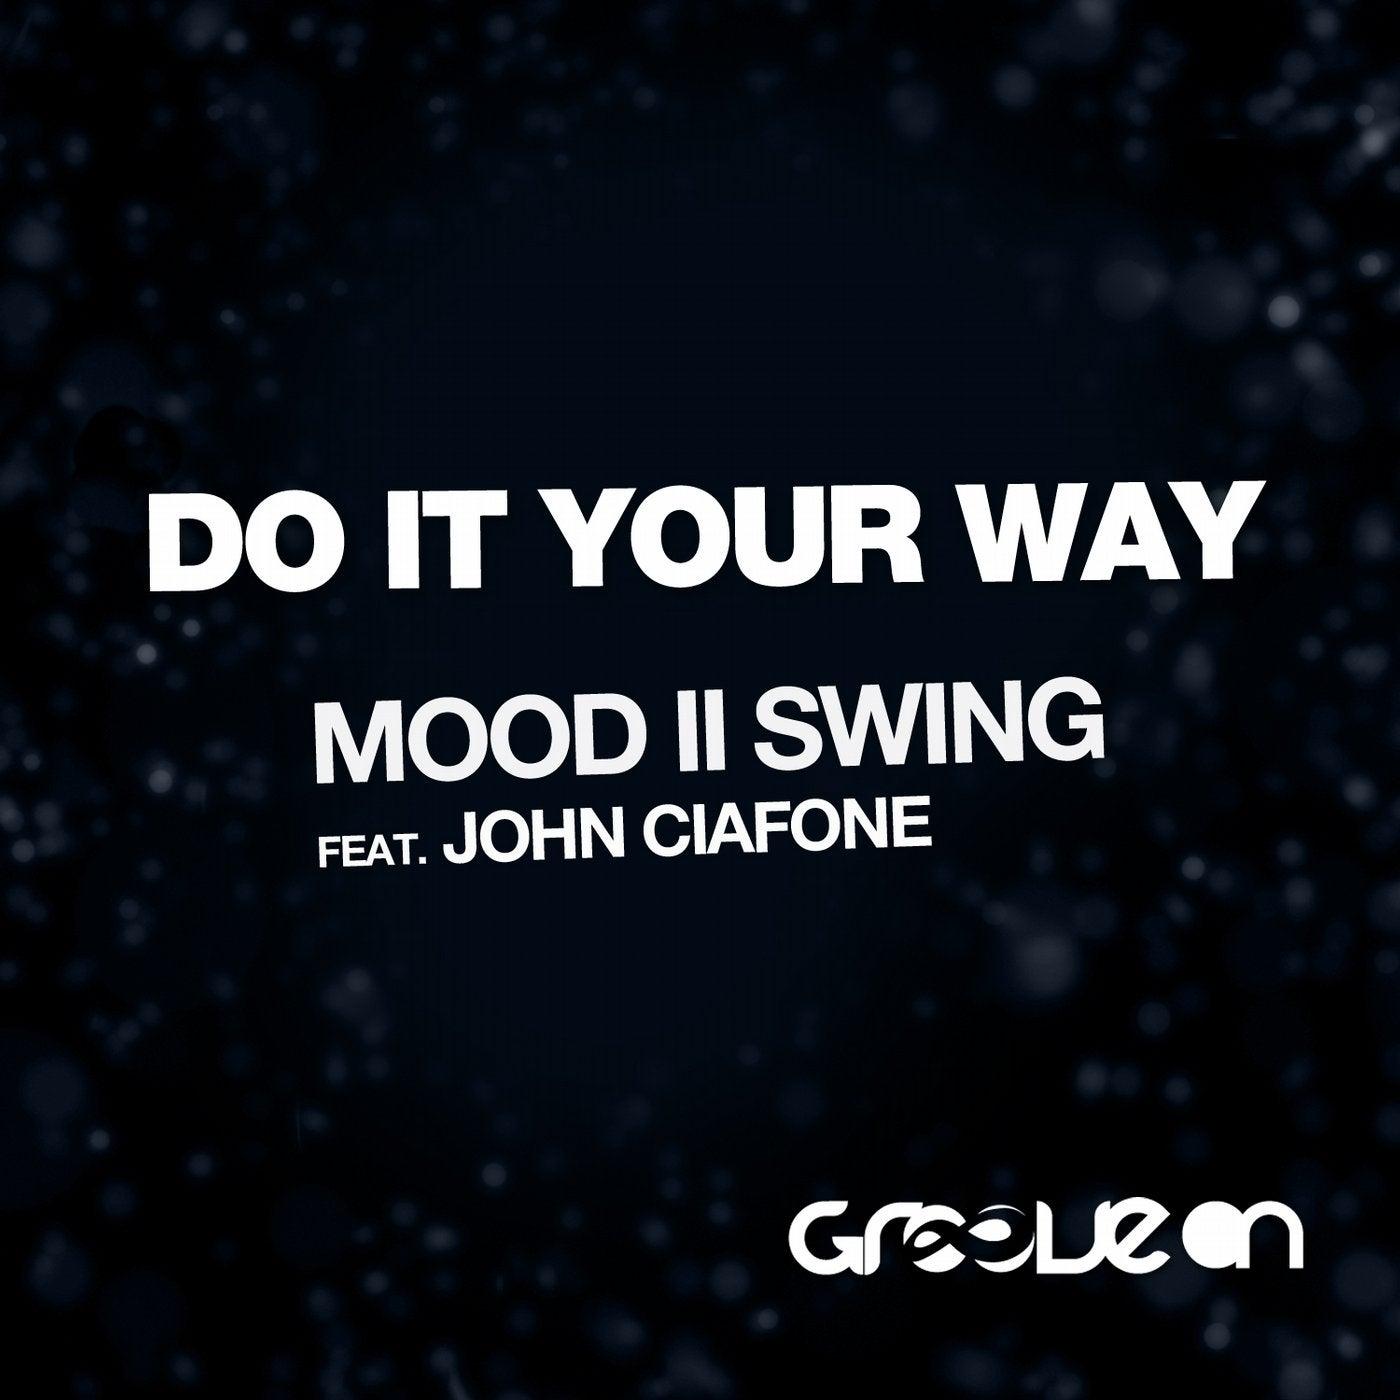 Do It Your Way (Original Mix)